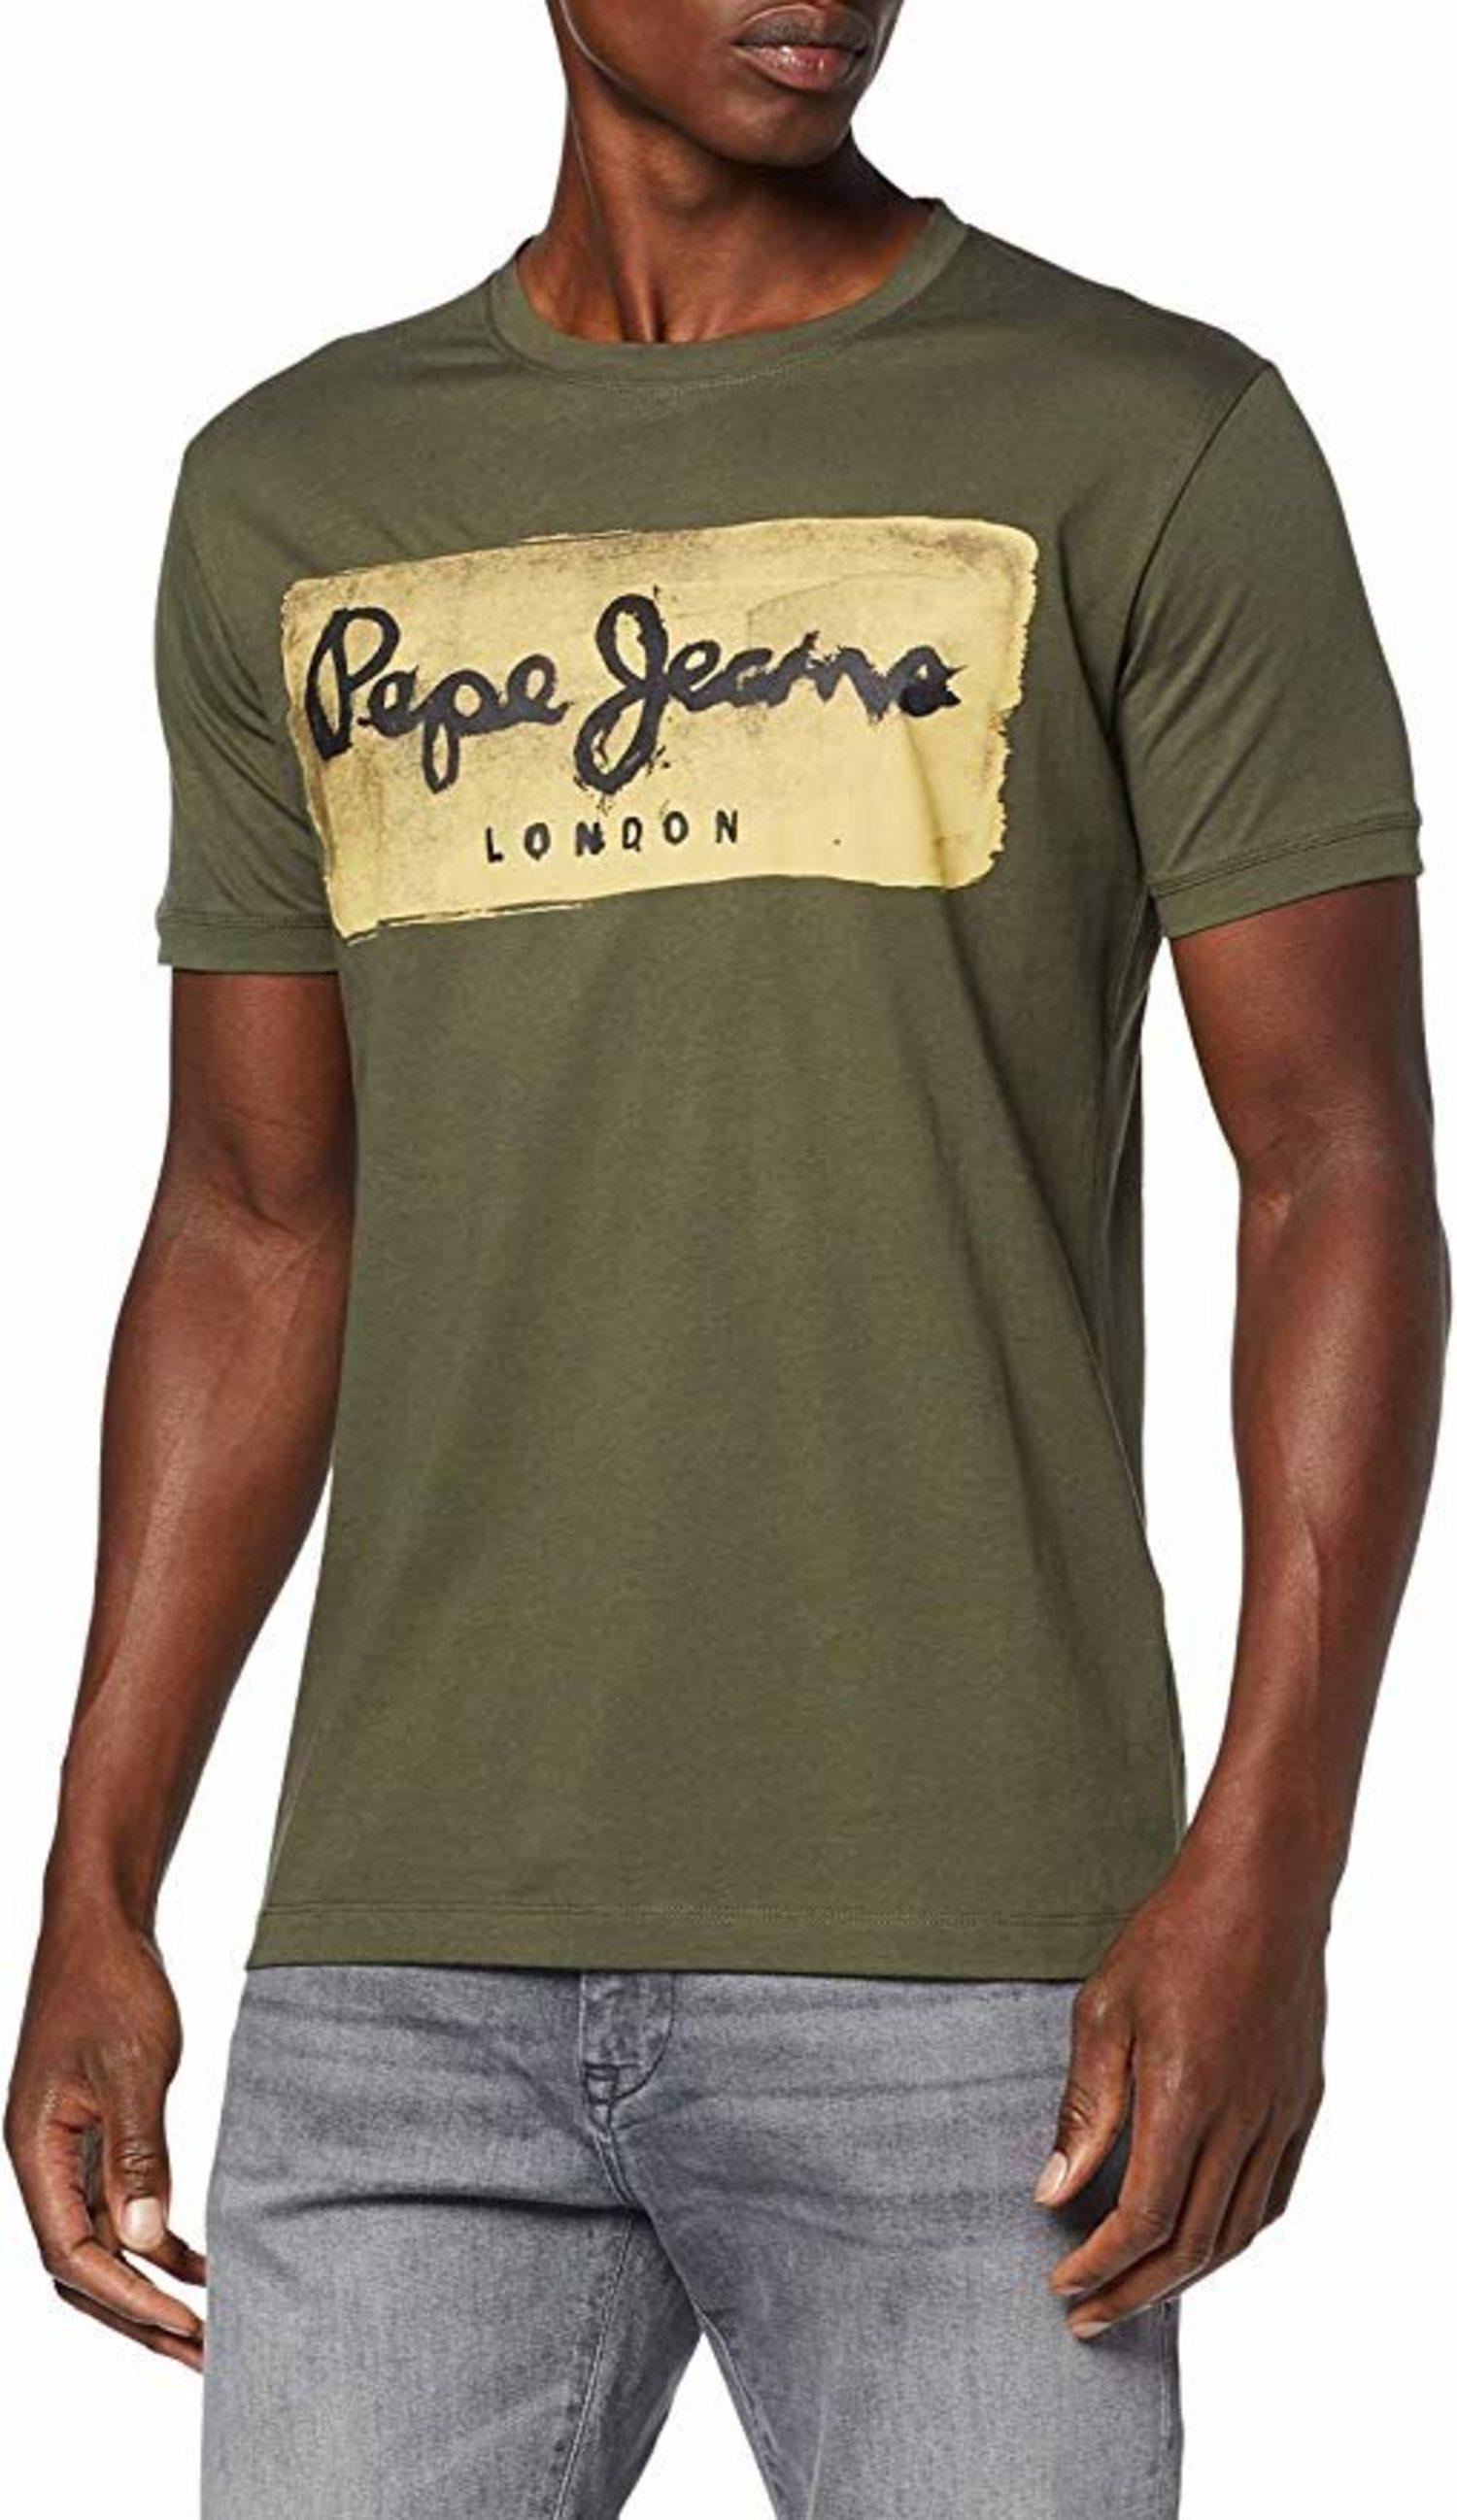 Camiseta Pepe Jeans gráfico.